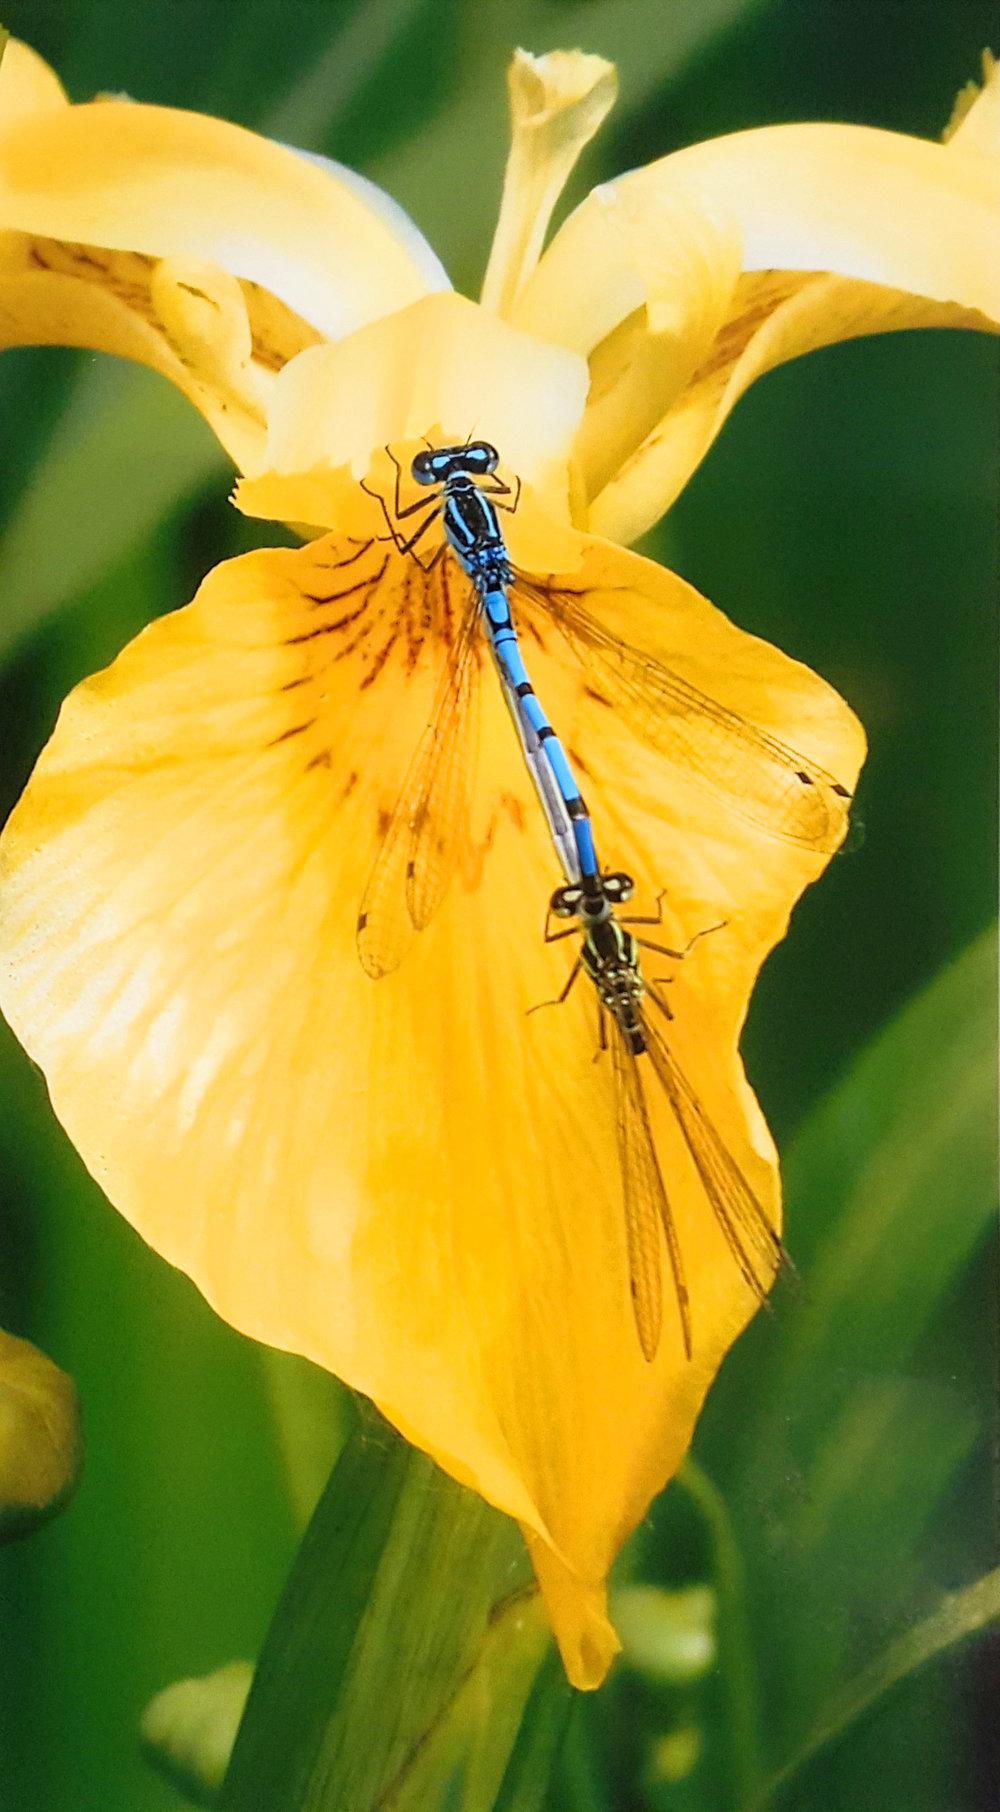 3. Kieley Evans - Damselfly mating on leaf